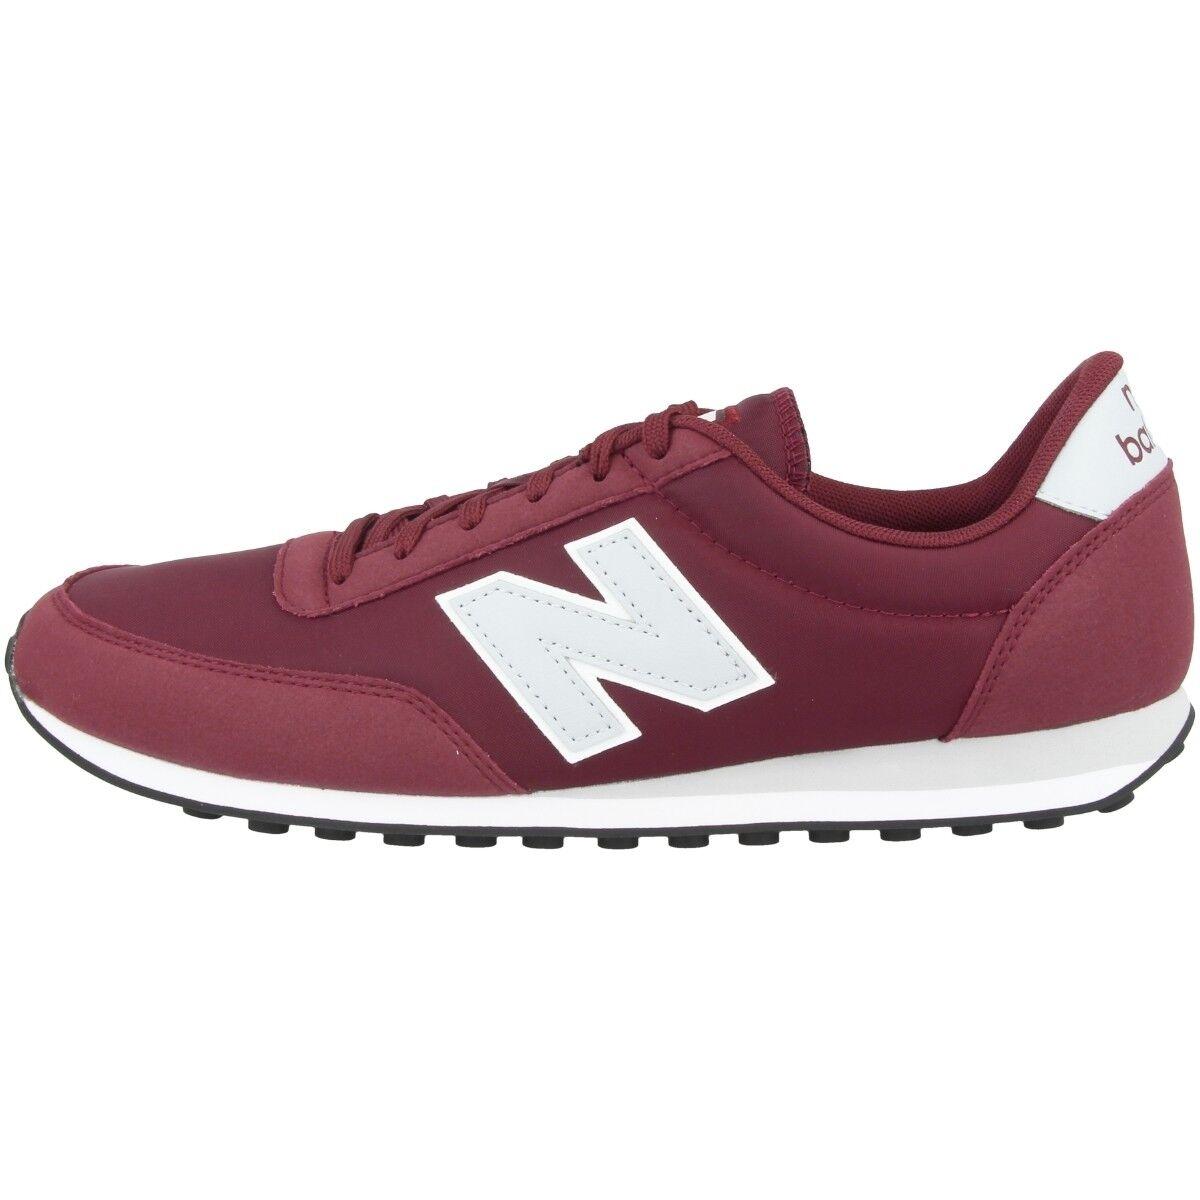 New Balance U 410 BUG Schuhe Sport Freizeit Sneaker Turnschuhe burgundy U410BUG